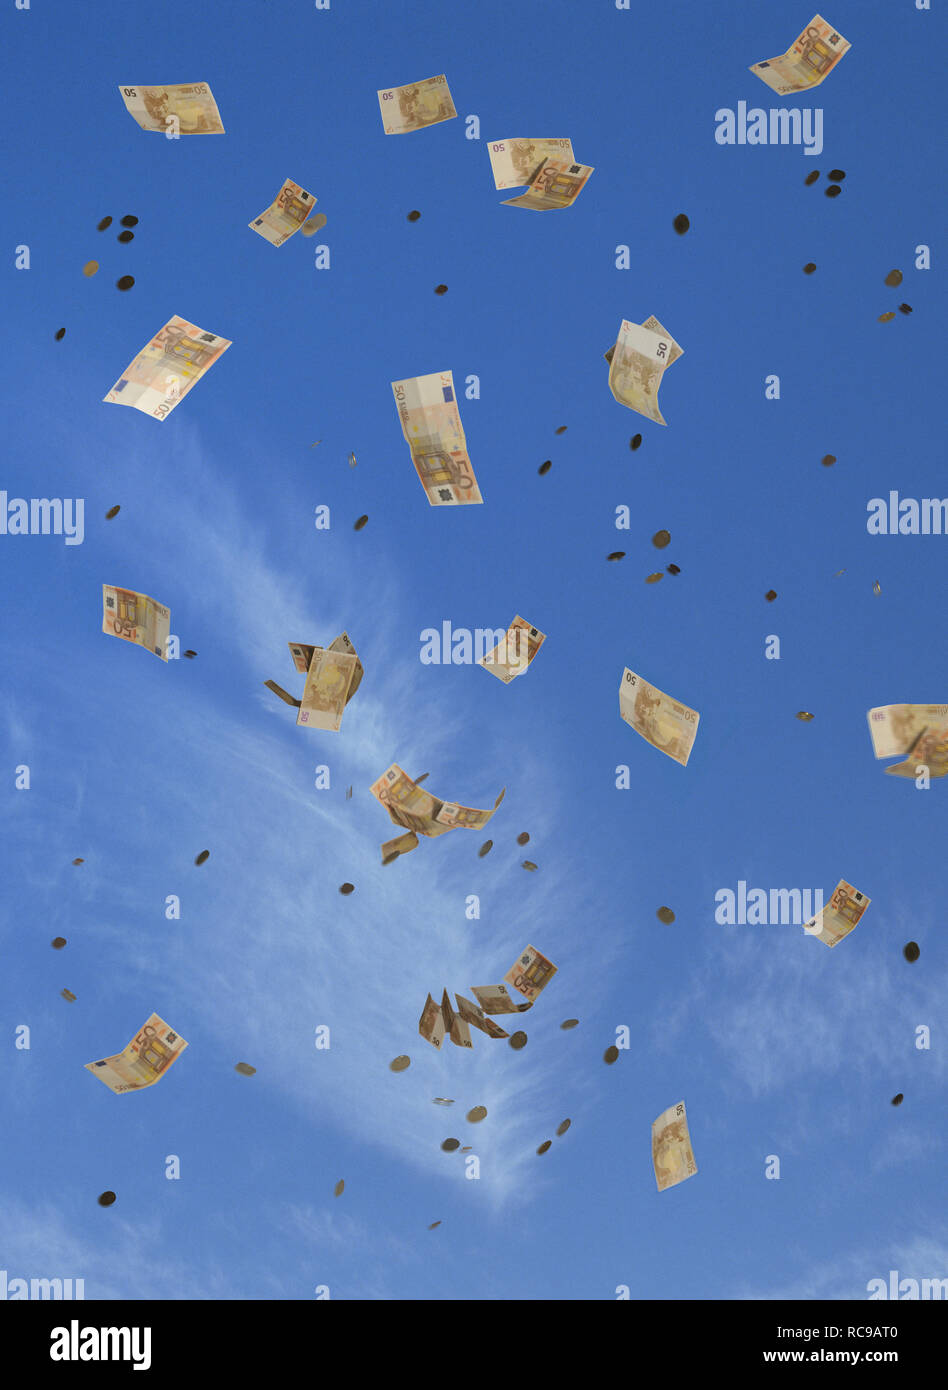 Geldregen | money rain Stock Photo